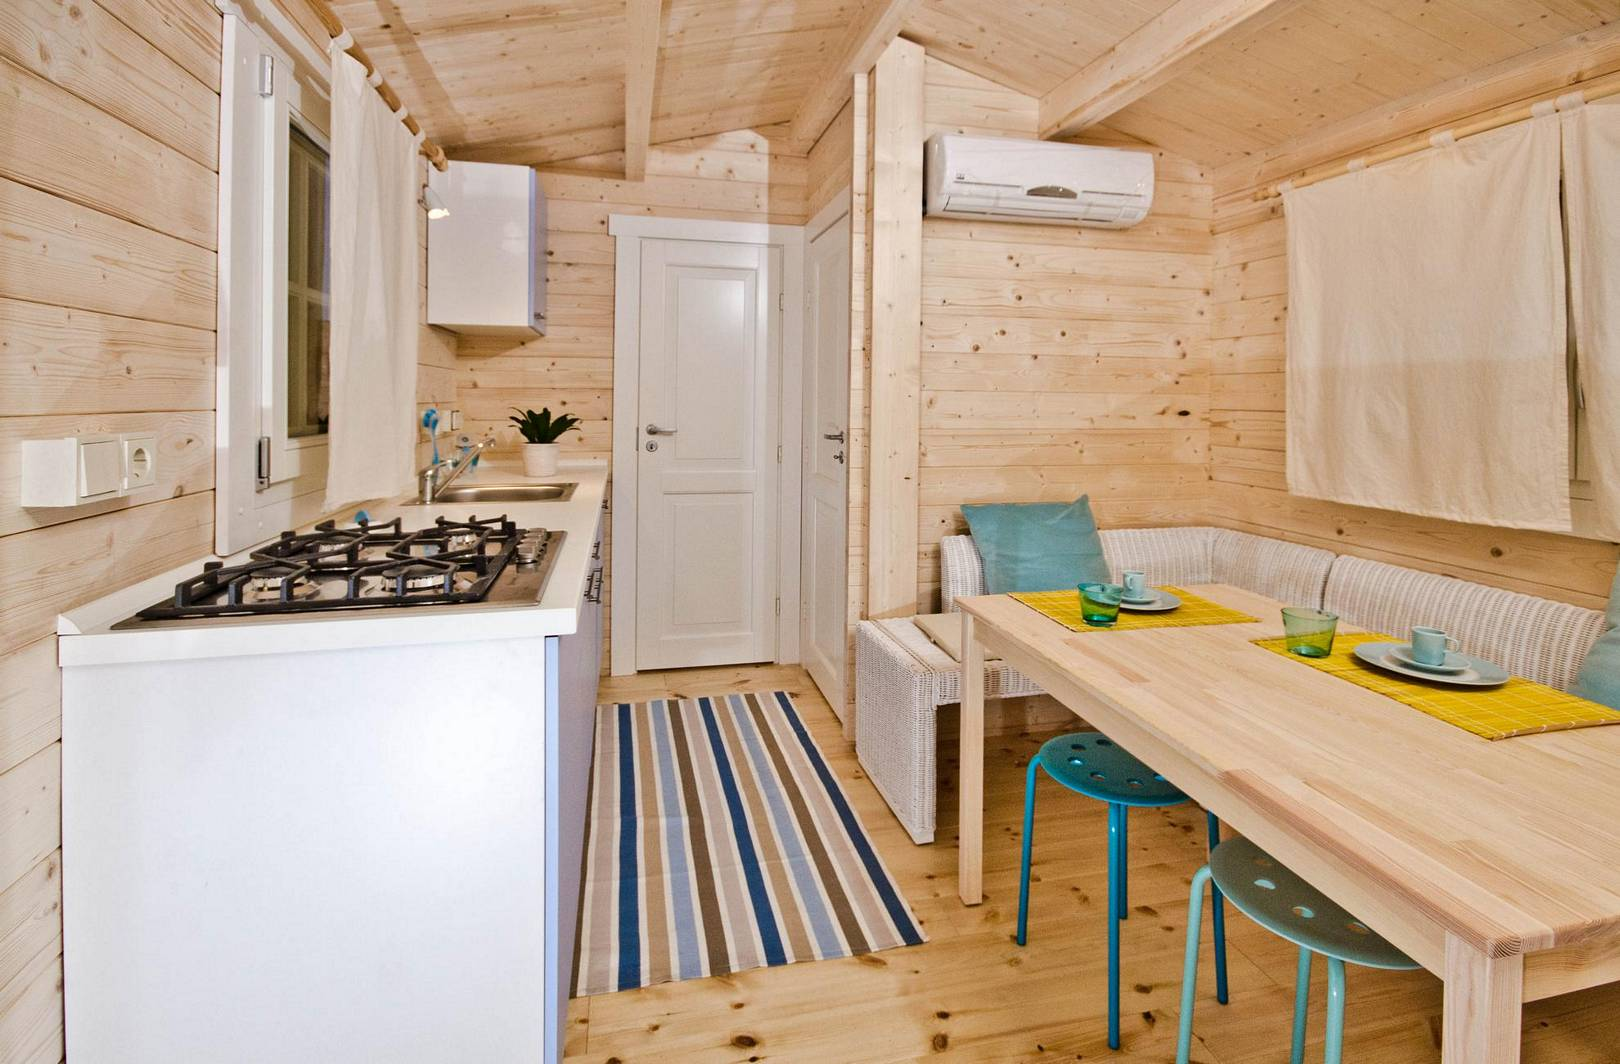 mobilheim lina. Black Bedroom Furniture Sets. Home Design Ideas